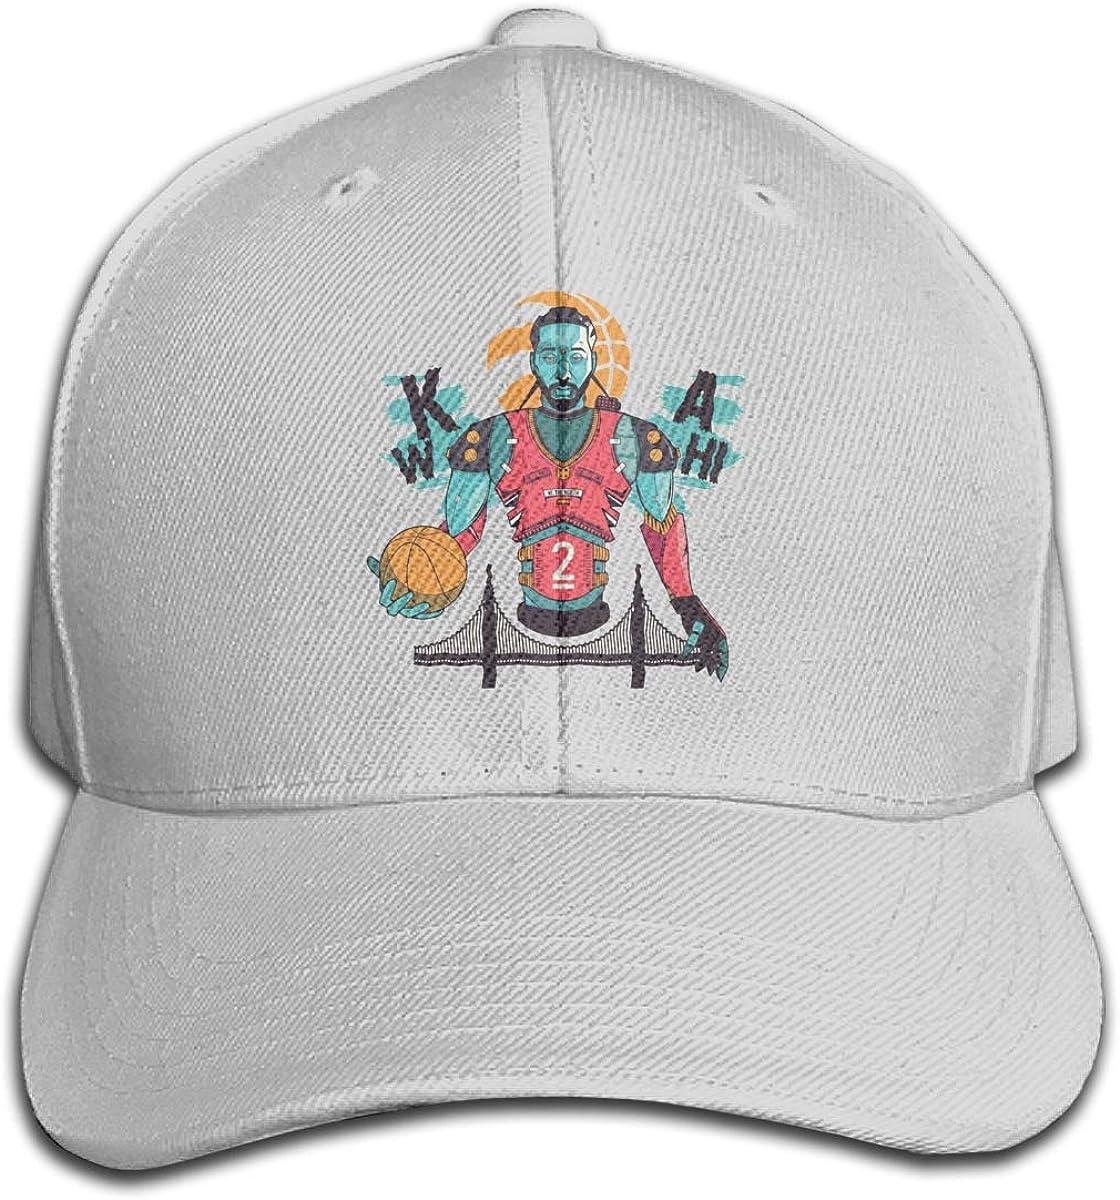 Haggai Romeo Unisex Kawhi-Leonard Pop Snapback Baseball Cap Flat Brim Hip Hop Hat Adjustable Dad Hat